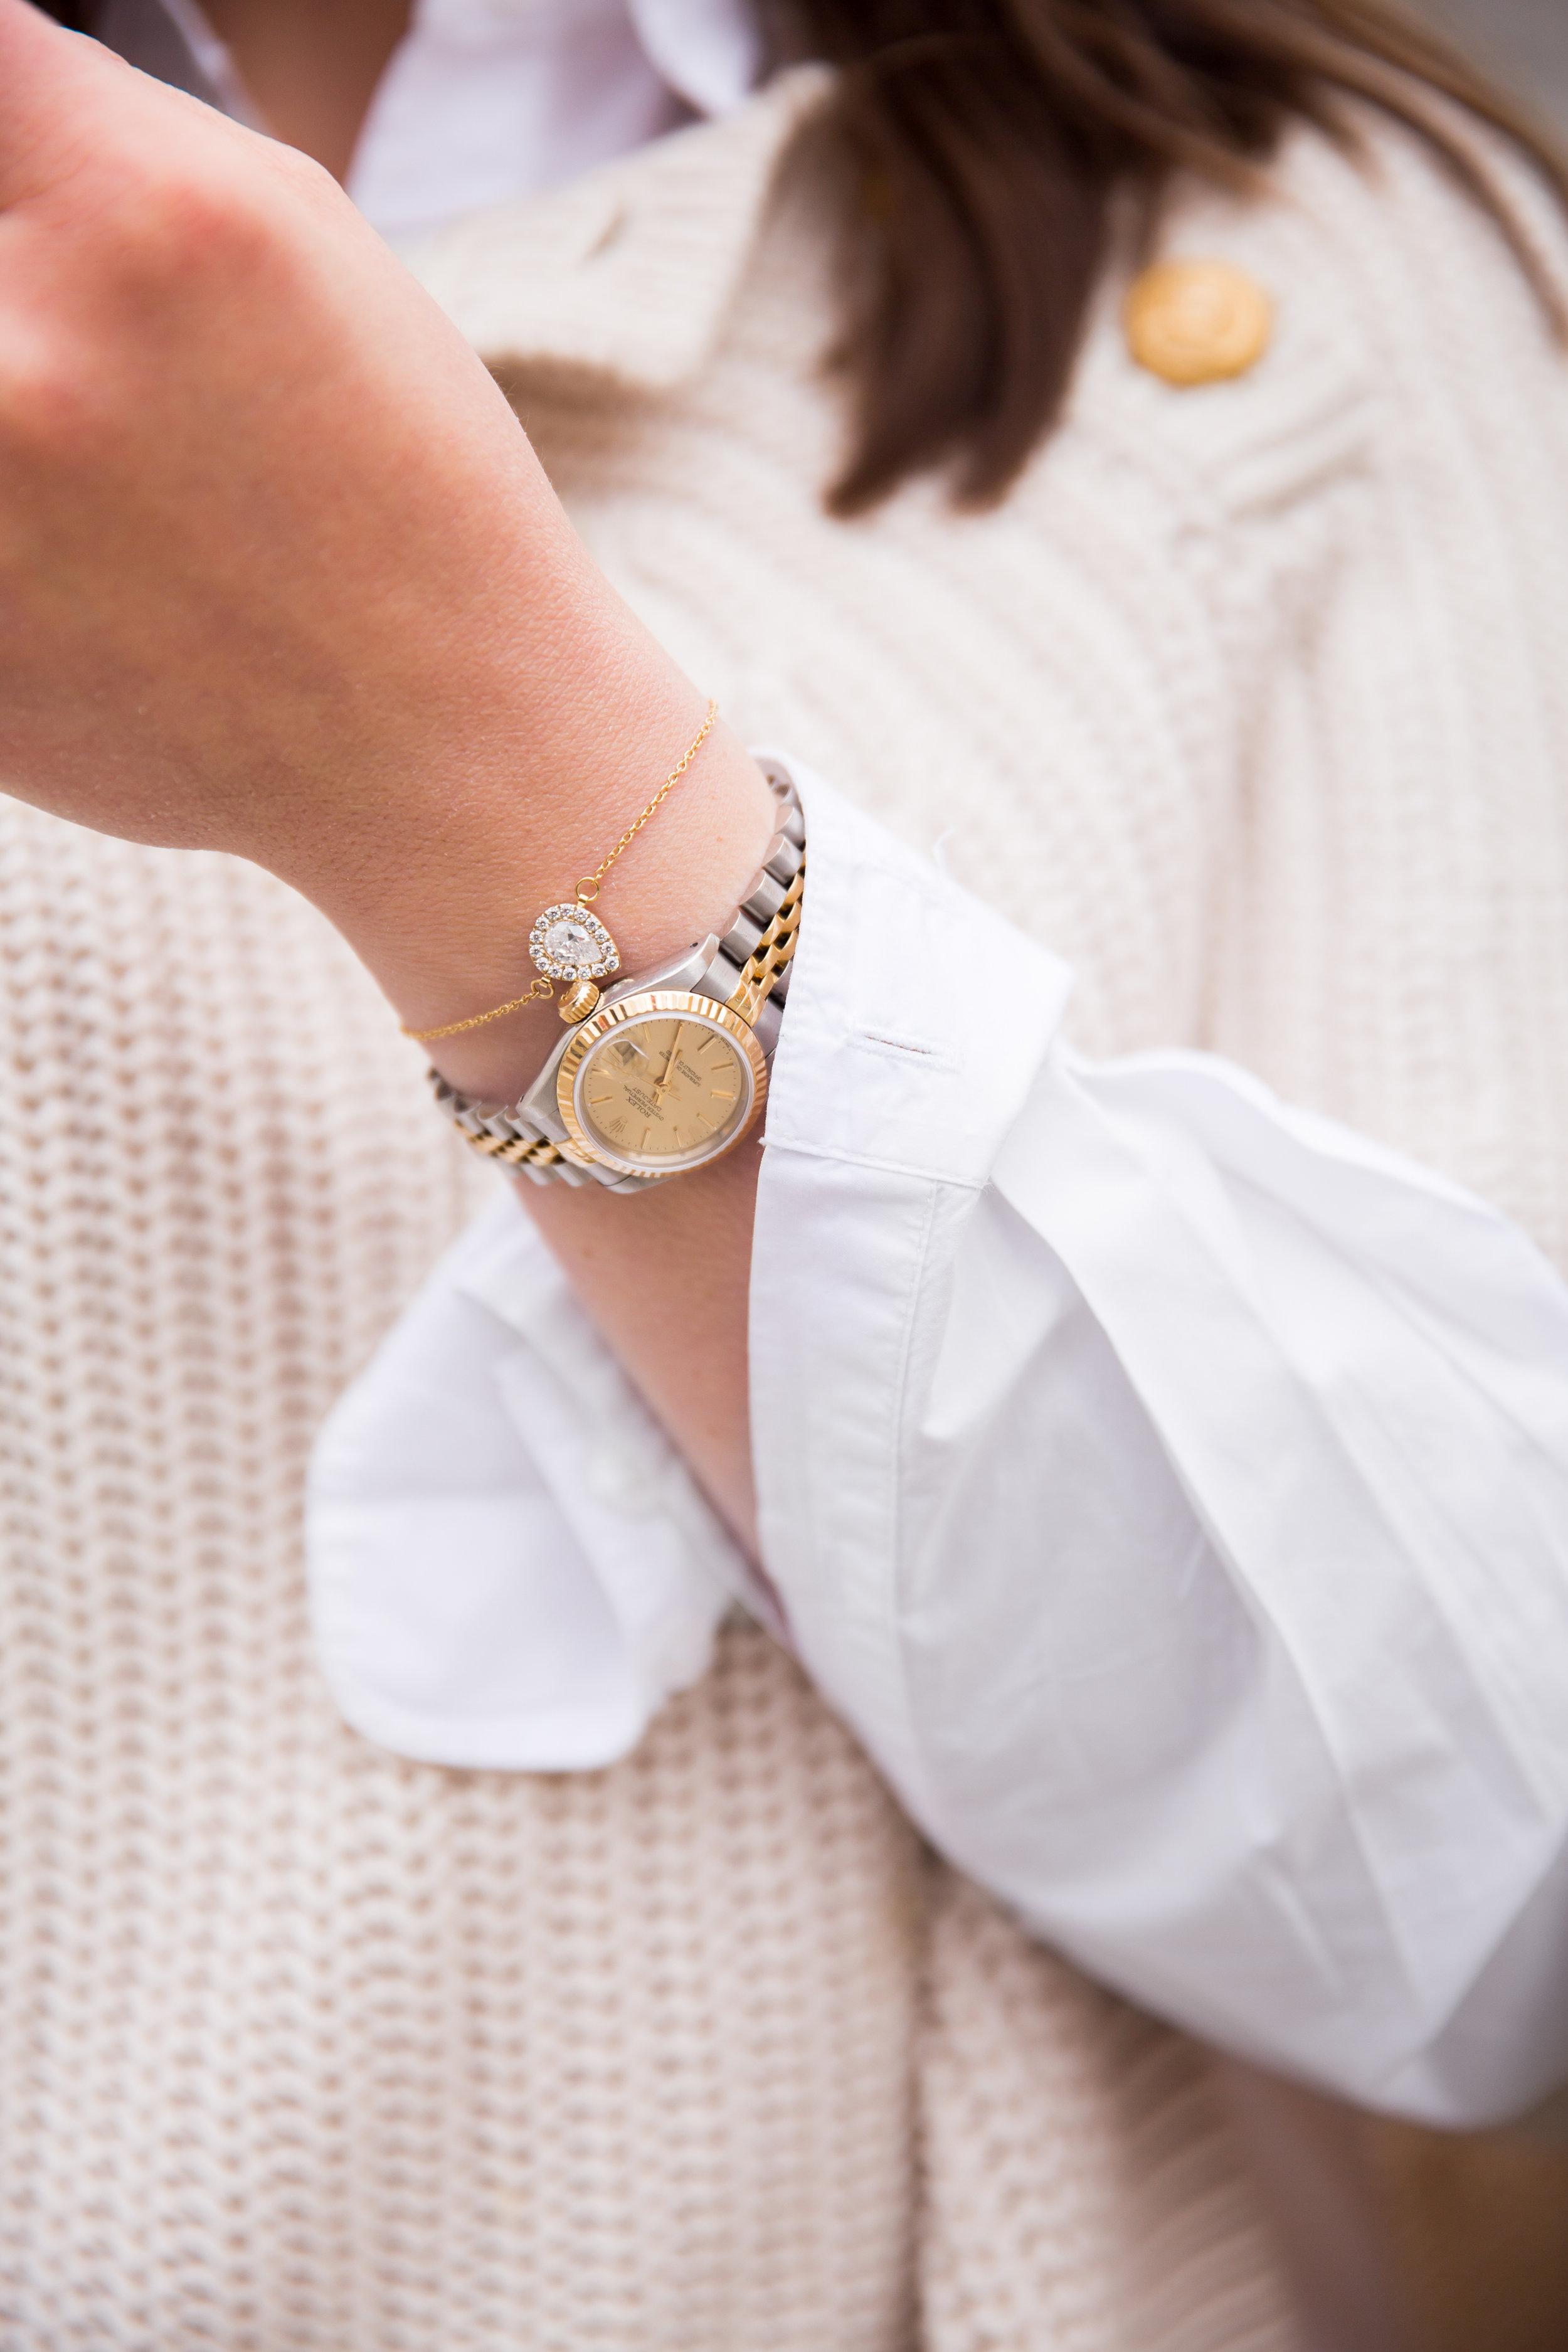 Edblad armband Rolex klocka Angelicas Closet.jpg